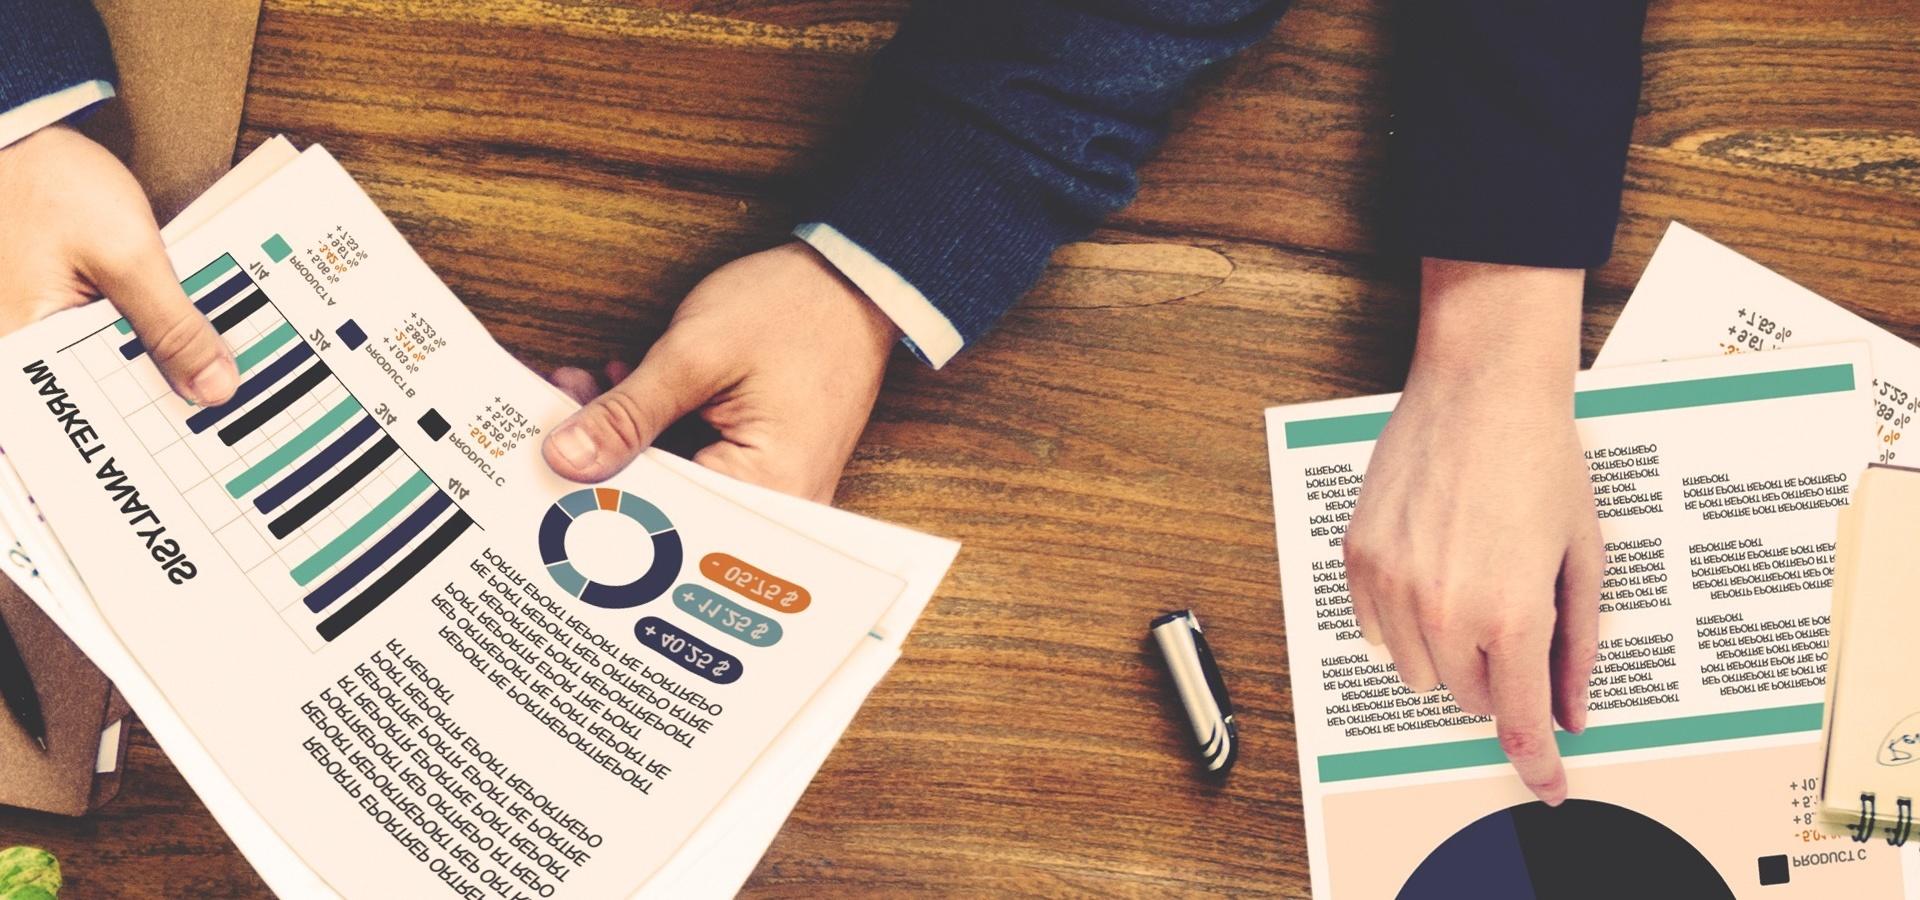 blog marketing research-1.jpg